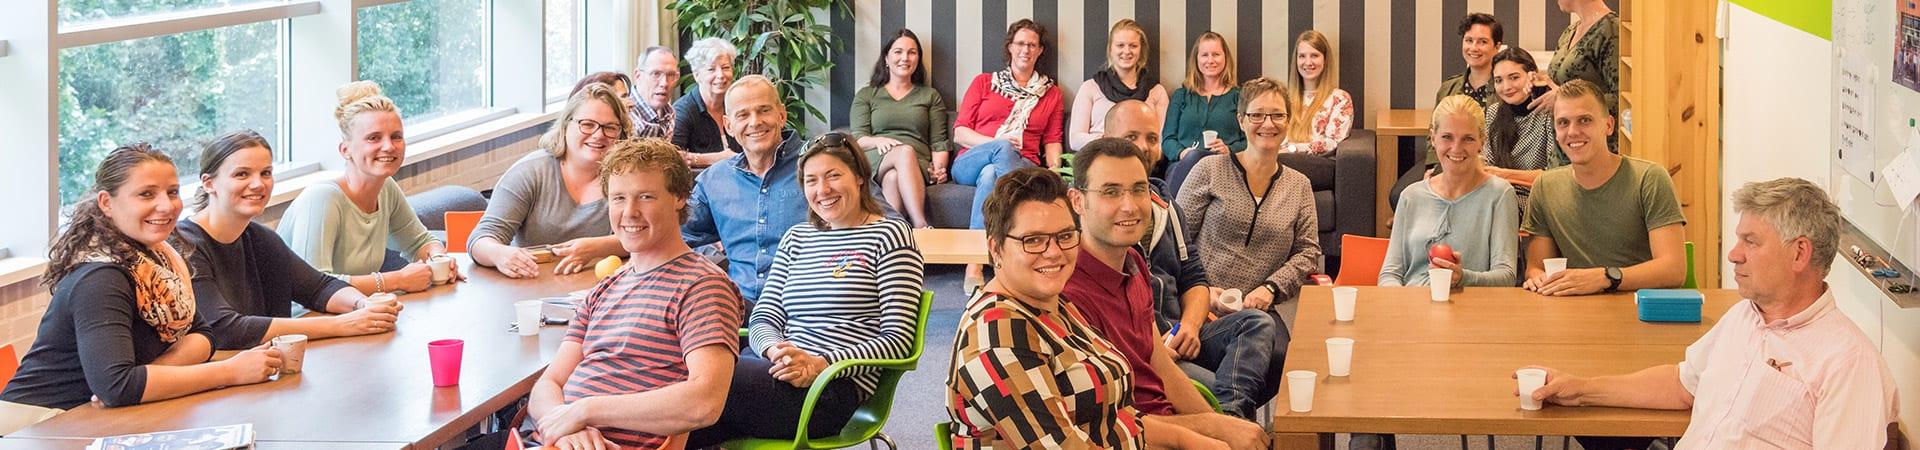 afbeelding team Griendencollege